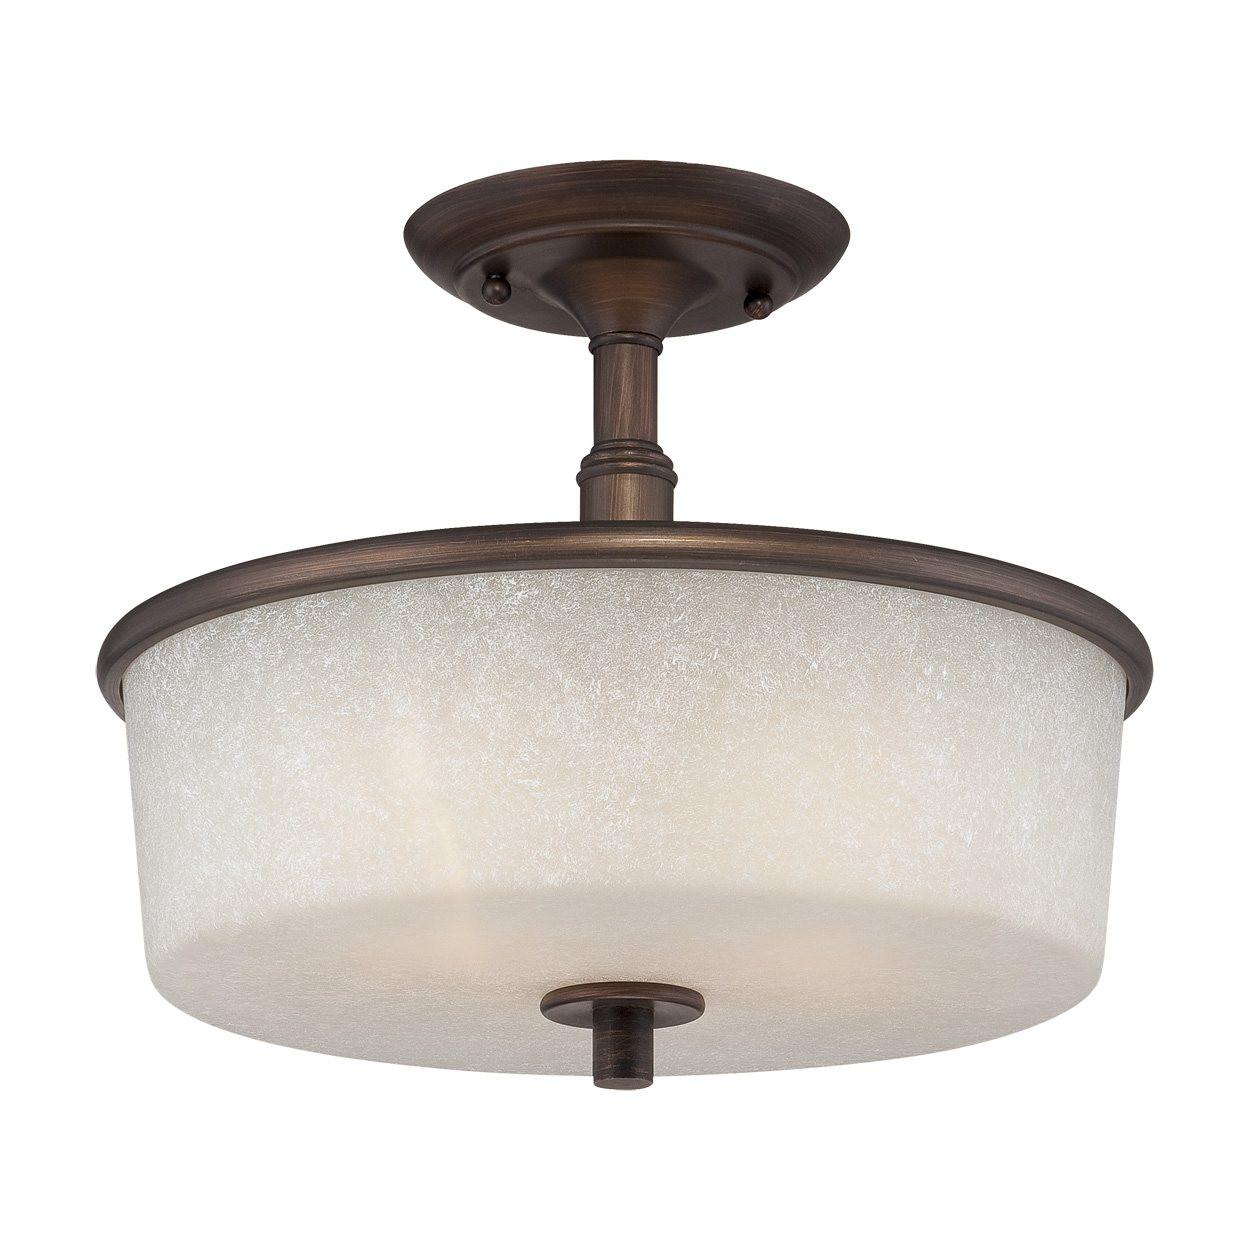 Best ideas about Semi Flush Mount Lighting . Save or Pin Millennium Lighting Dalton 2 Light Semi Flush Mount Now.